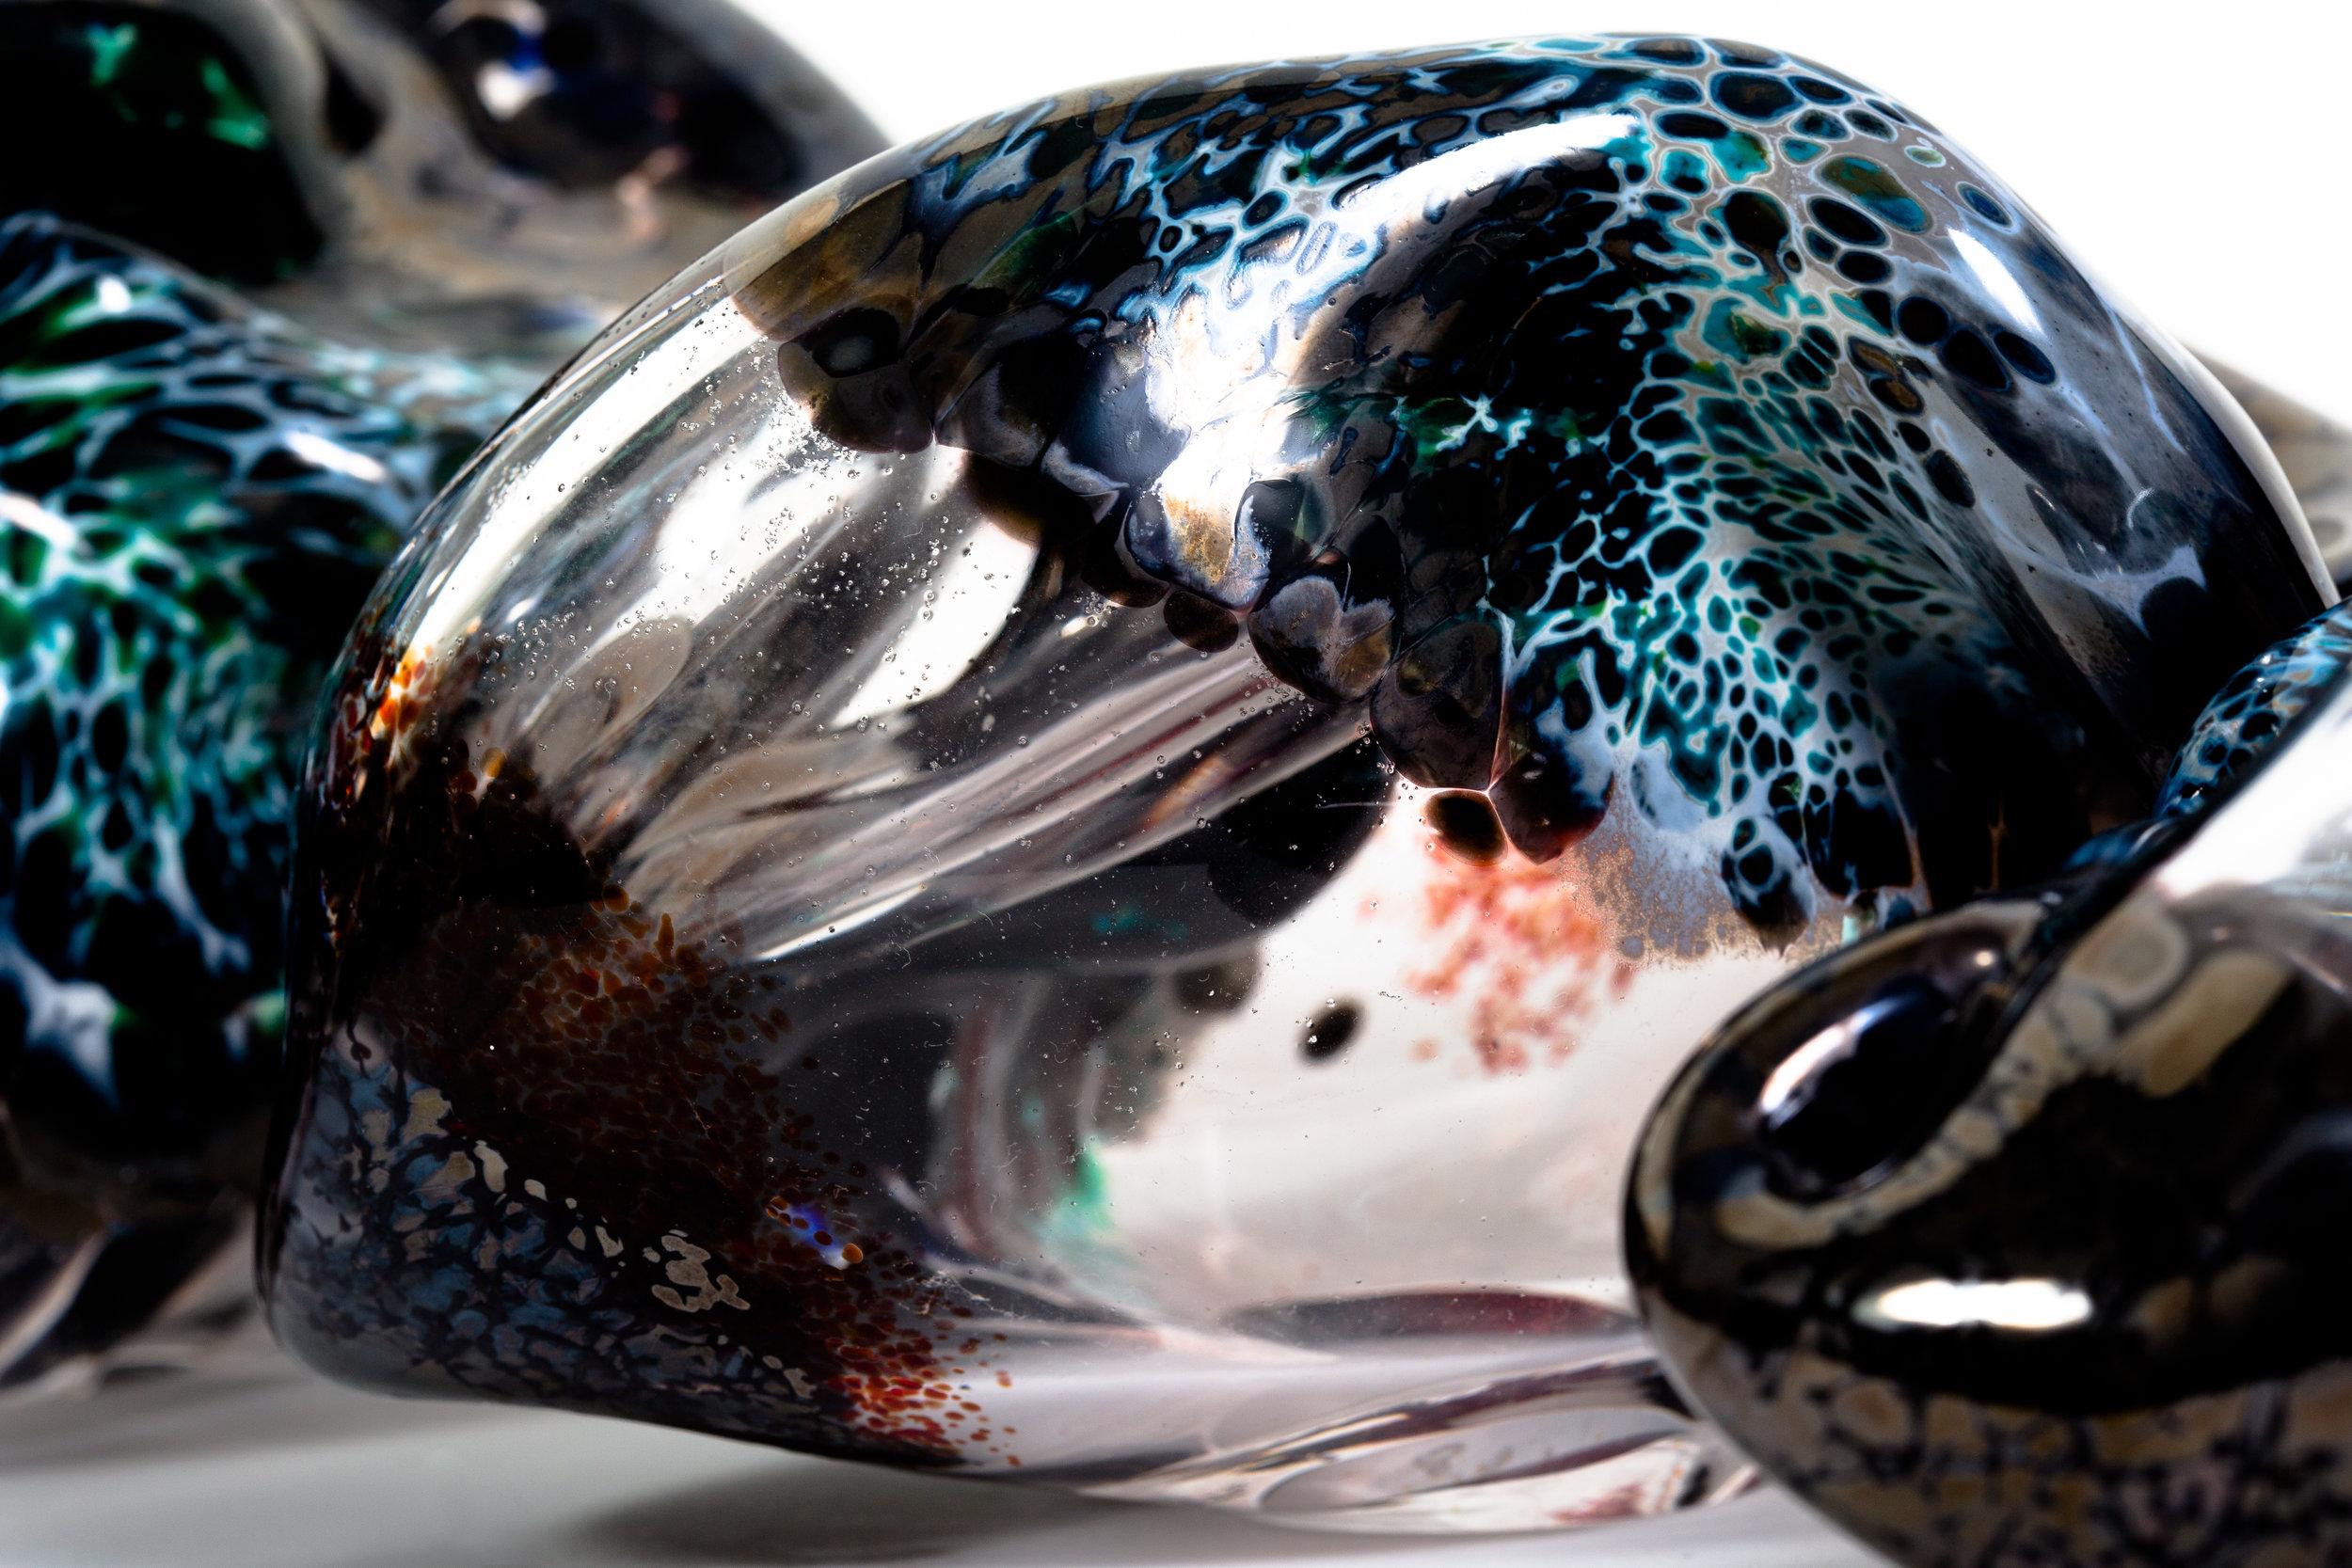 Sequential Distortion( detail) Blown glass